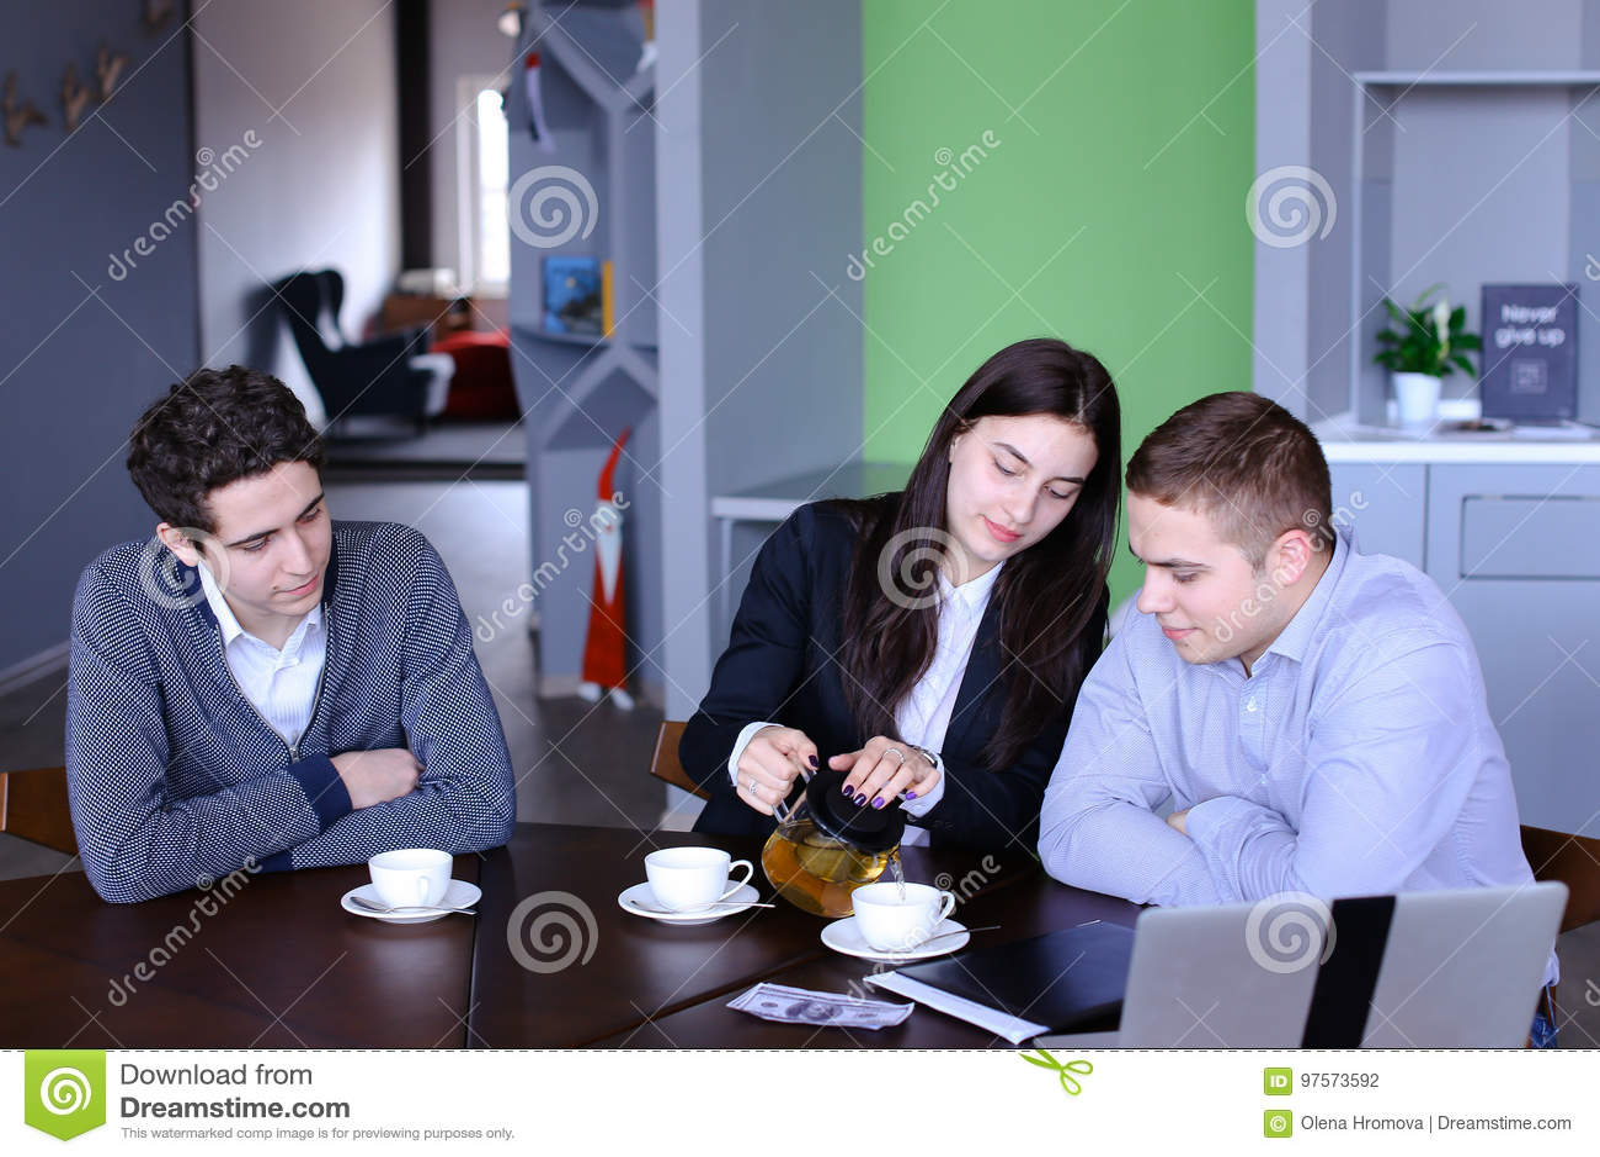 Душе девушка у своего парня на работе фото члена стуле